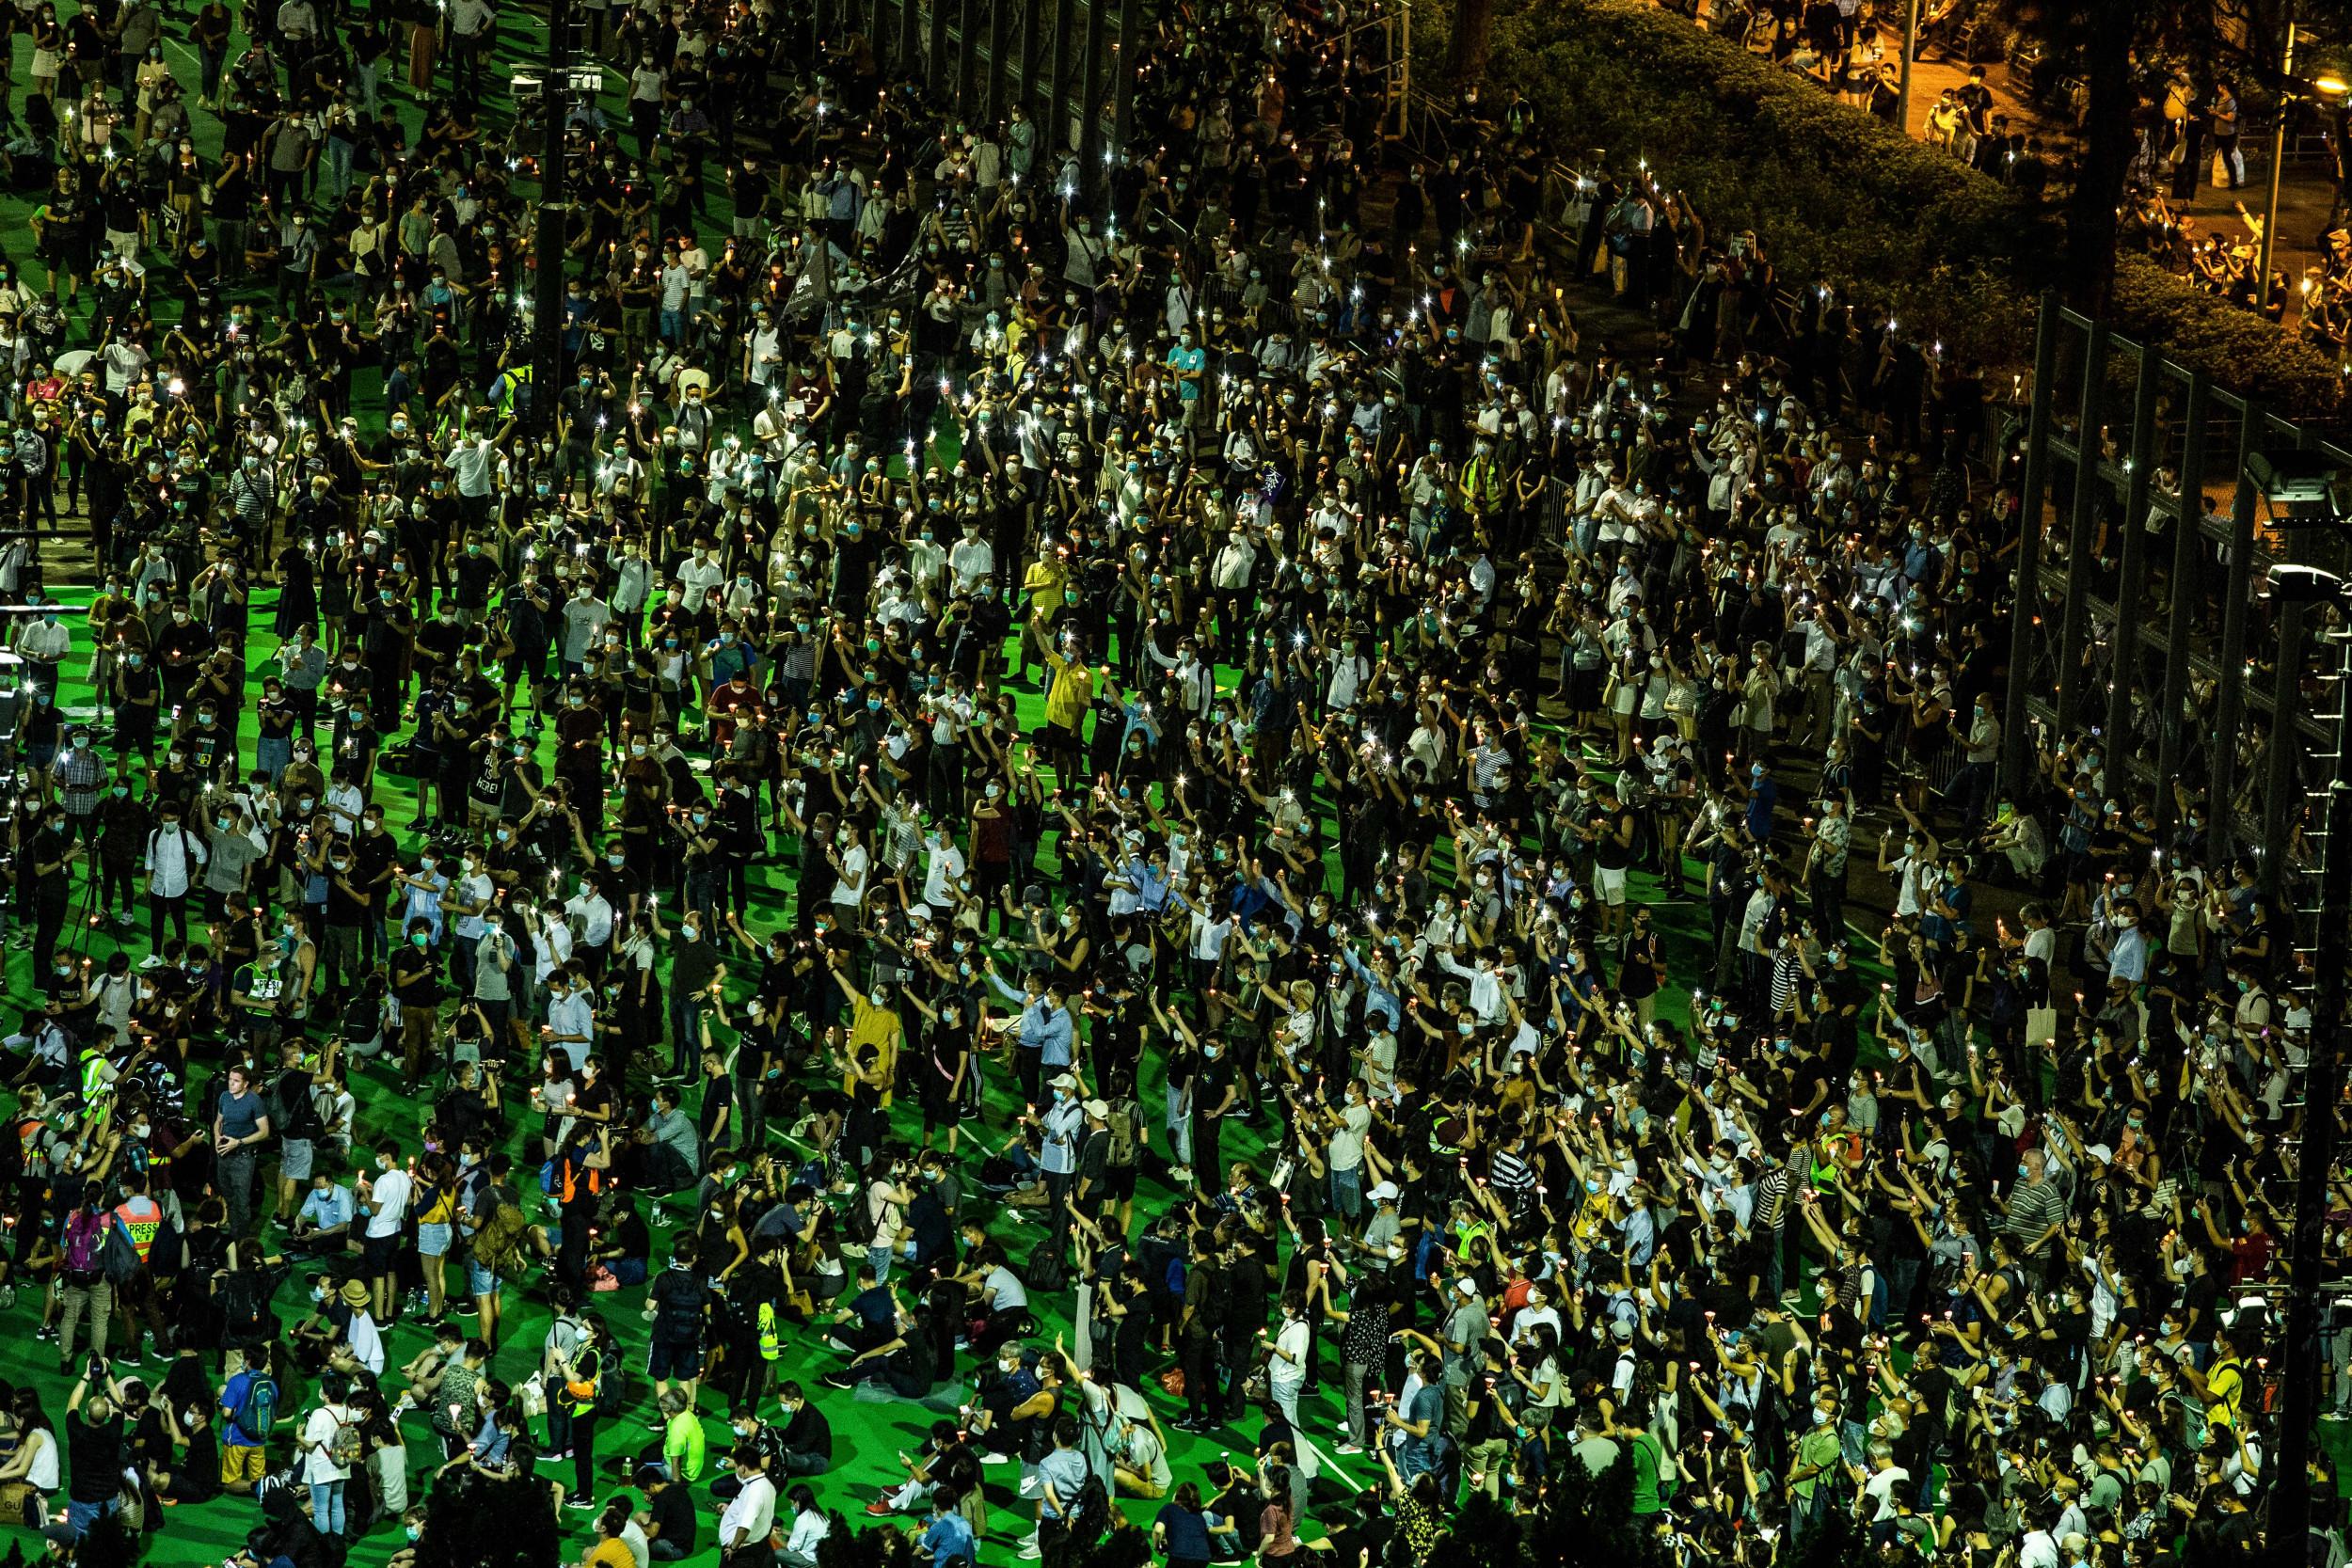 As China gloats over U.S. protests, Hong Kong police allow thousands to defy Tiananmen vigil ban